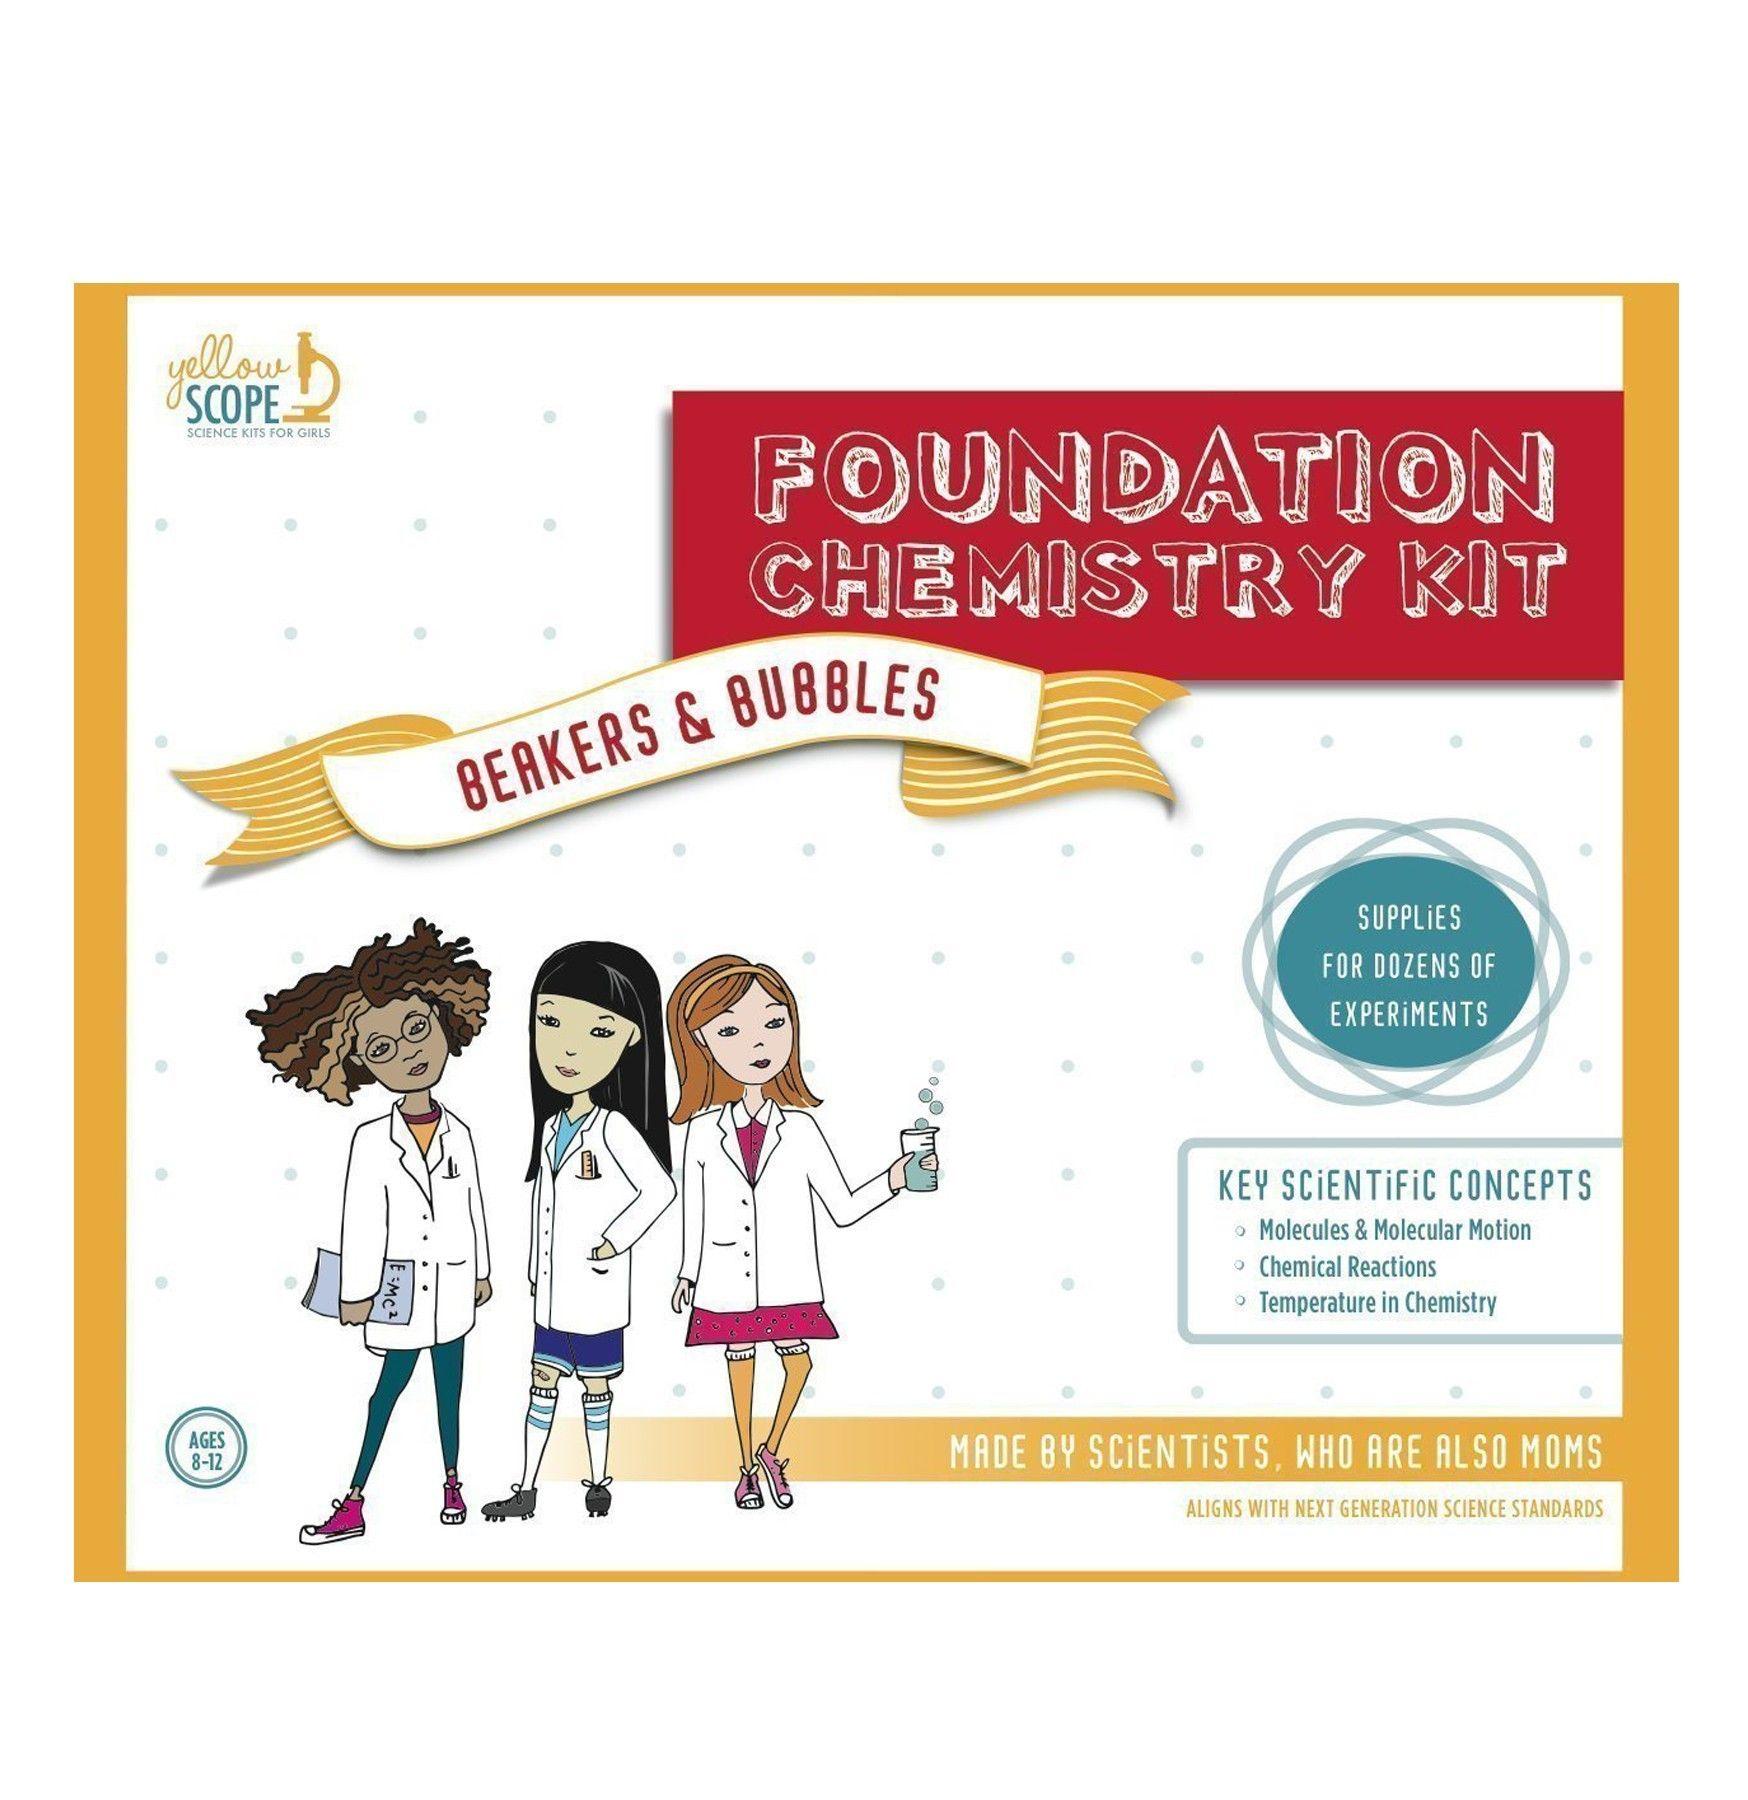 Foundation Chemistry Kit Chemistry, Cool gifts for kids